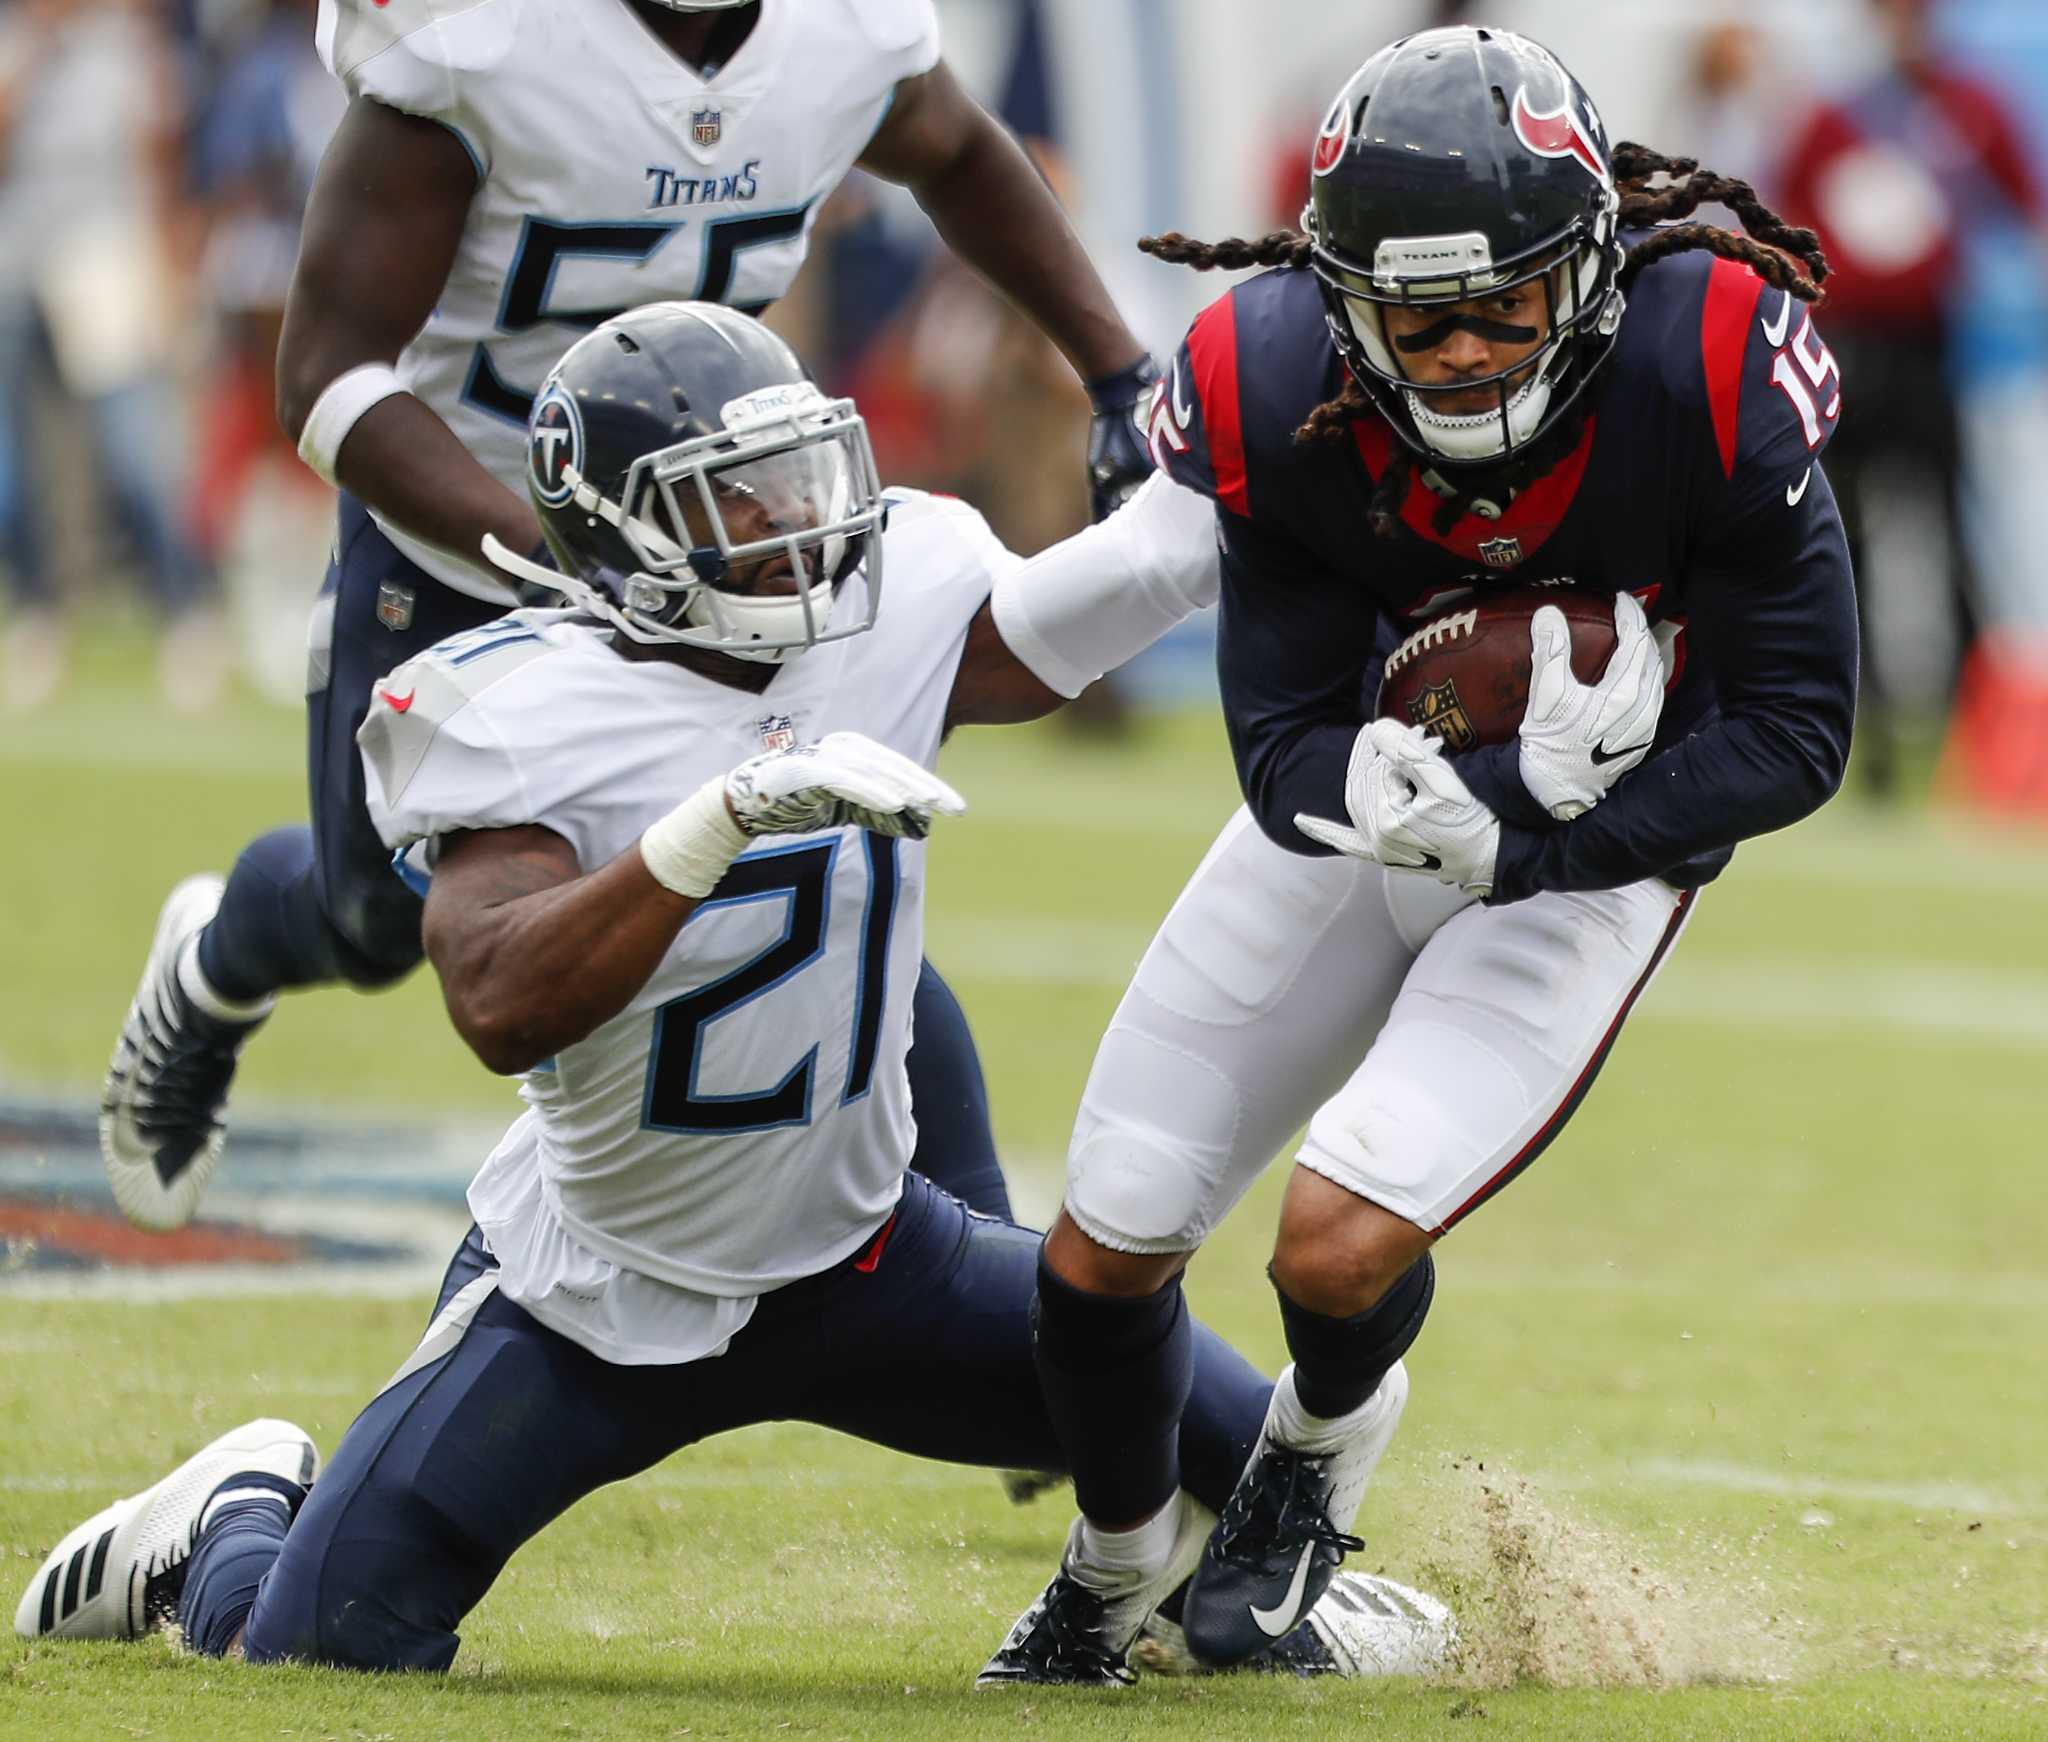 Texans at Titans: John McClain's scouting report